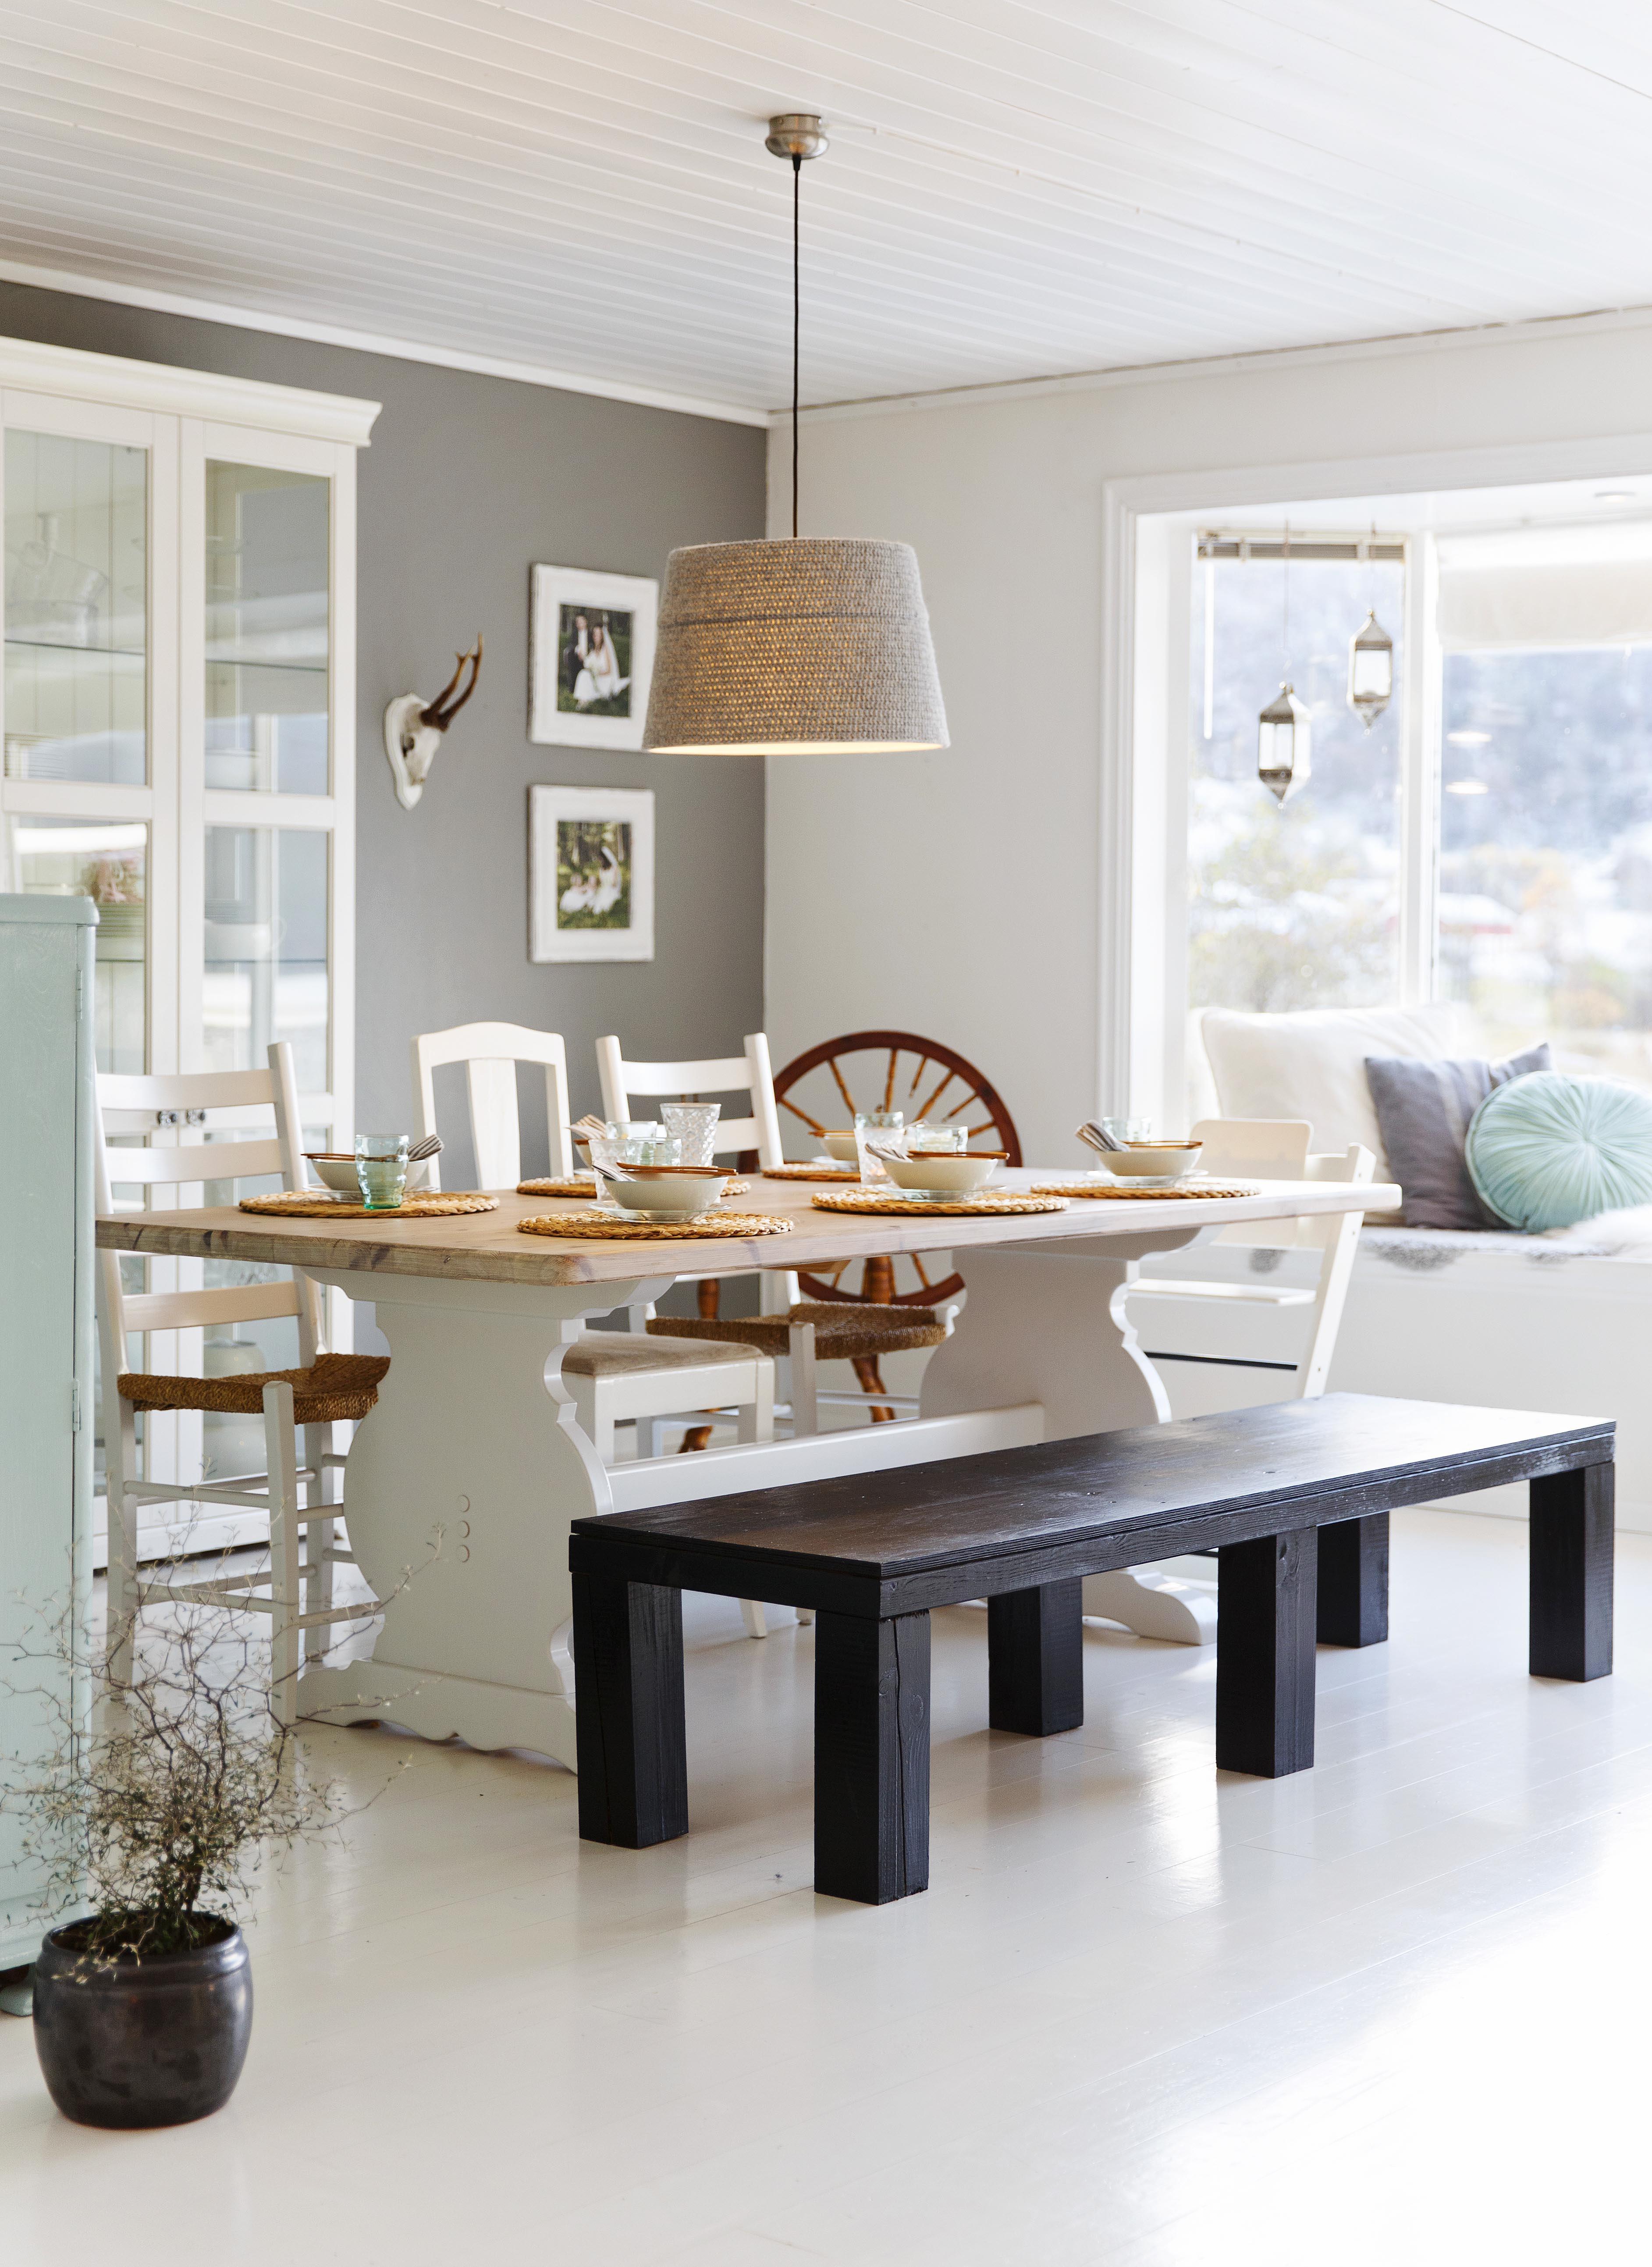 Romantisk idyll i stavanger - Casa estilo nordico ...